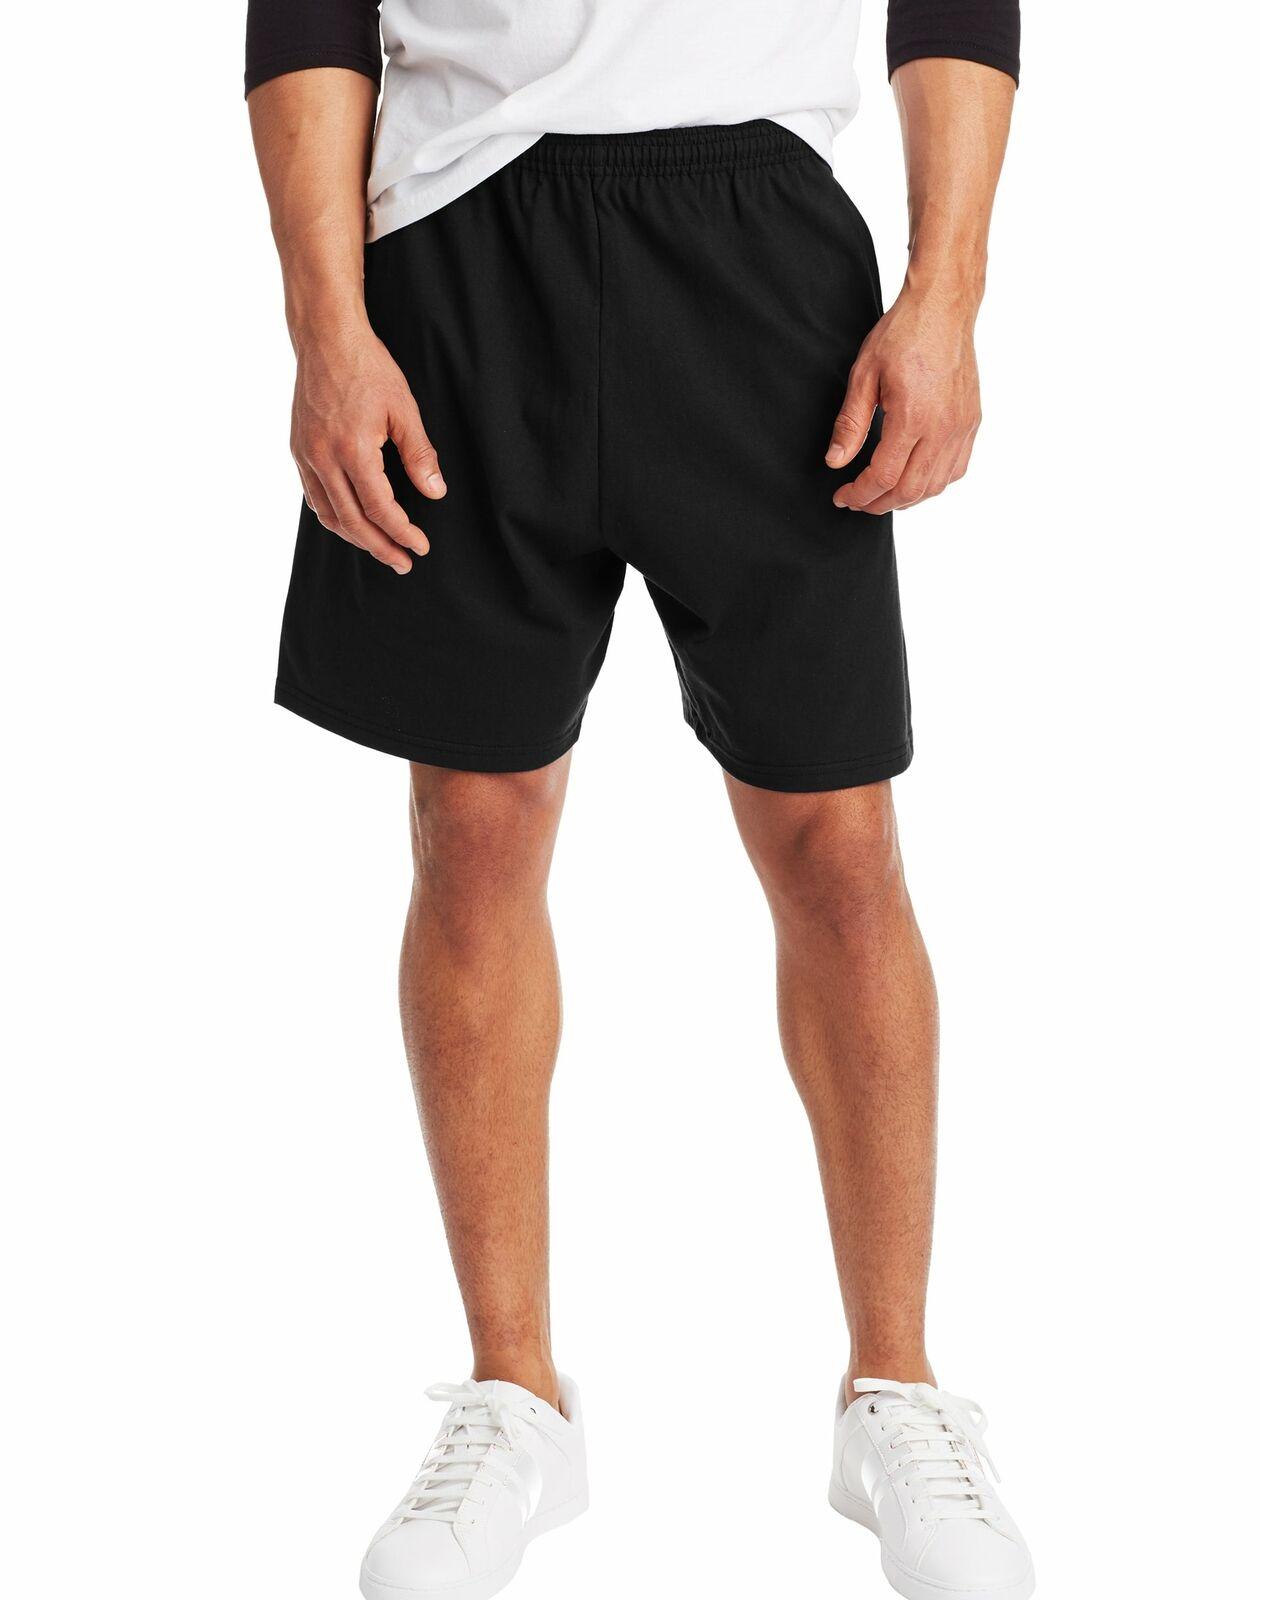 Hanes Men Shorts Jersey Pocket Elastic Waist 100% Cotton Solid 5 Colors S to 4XL